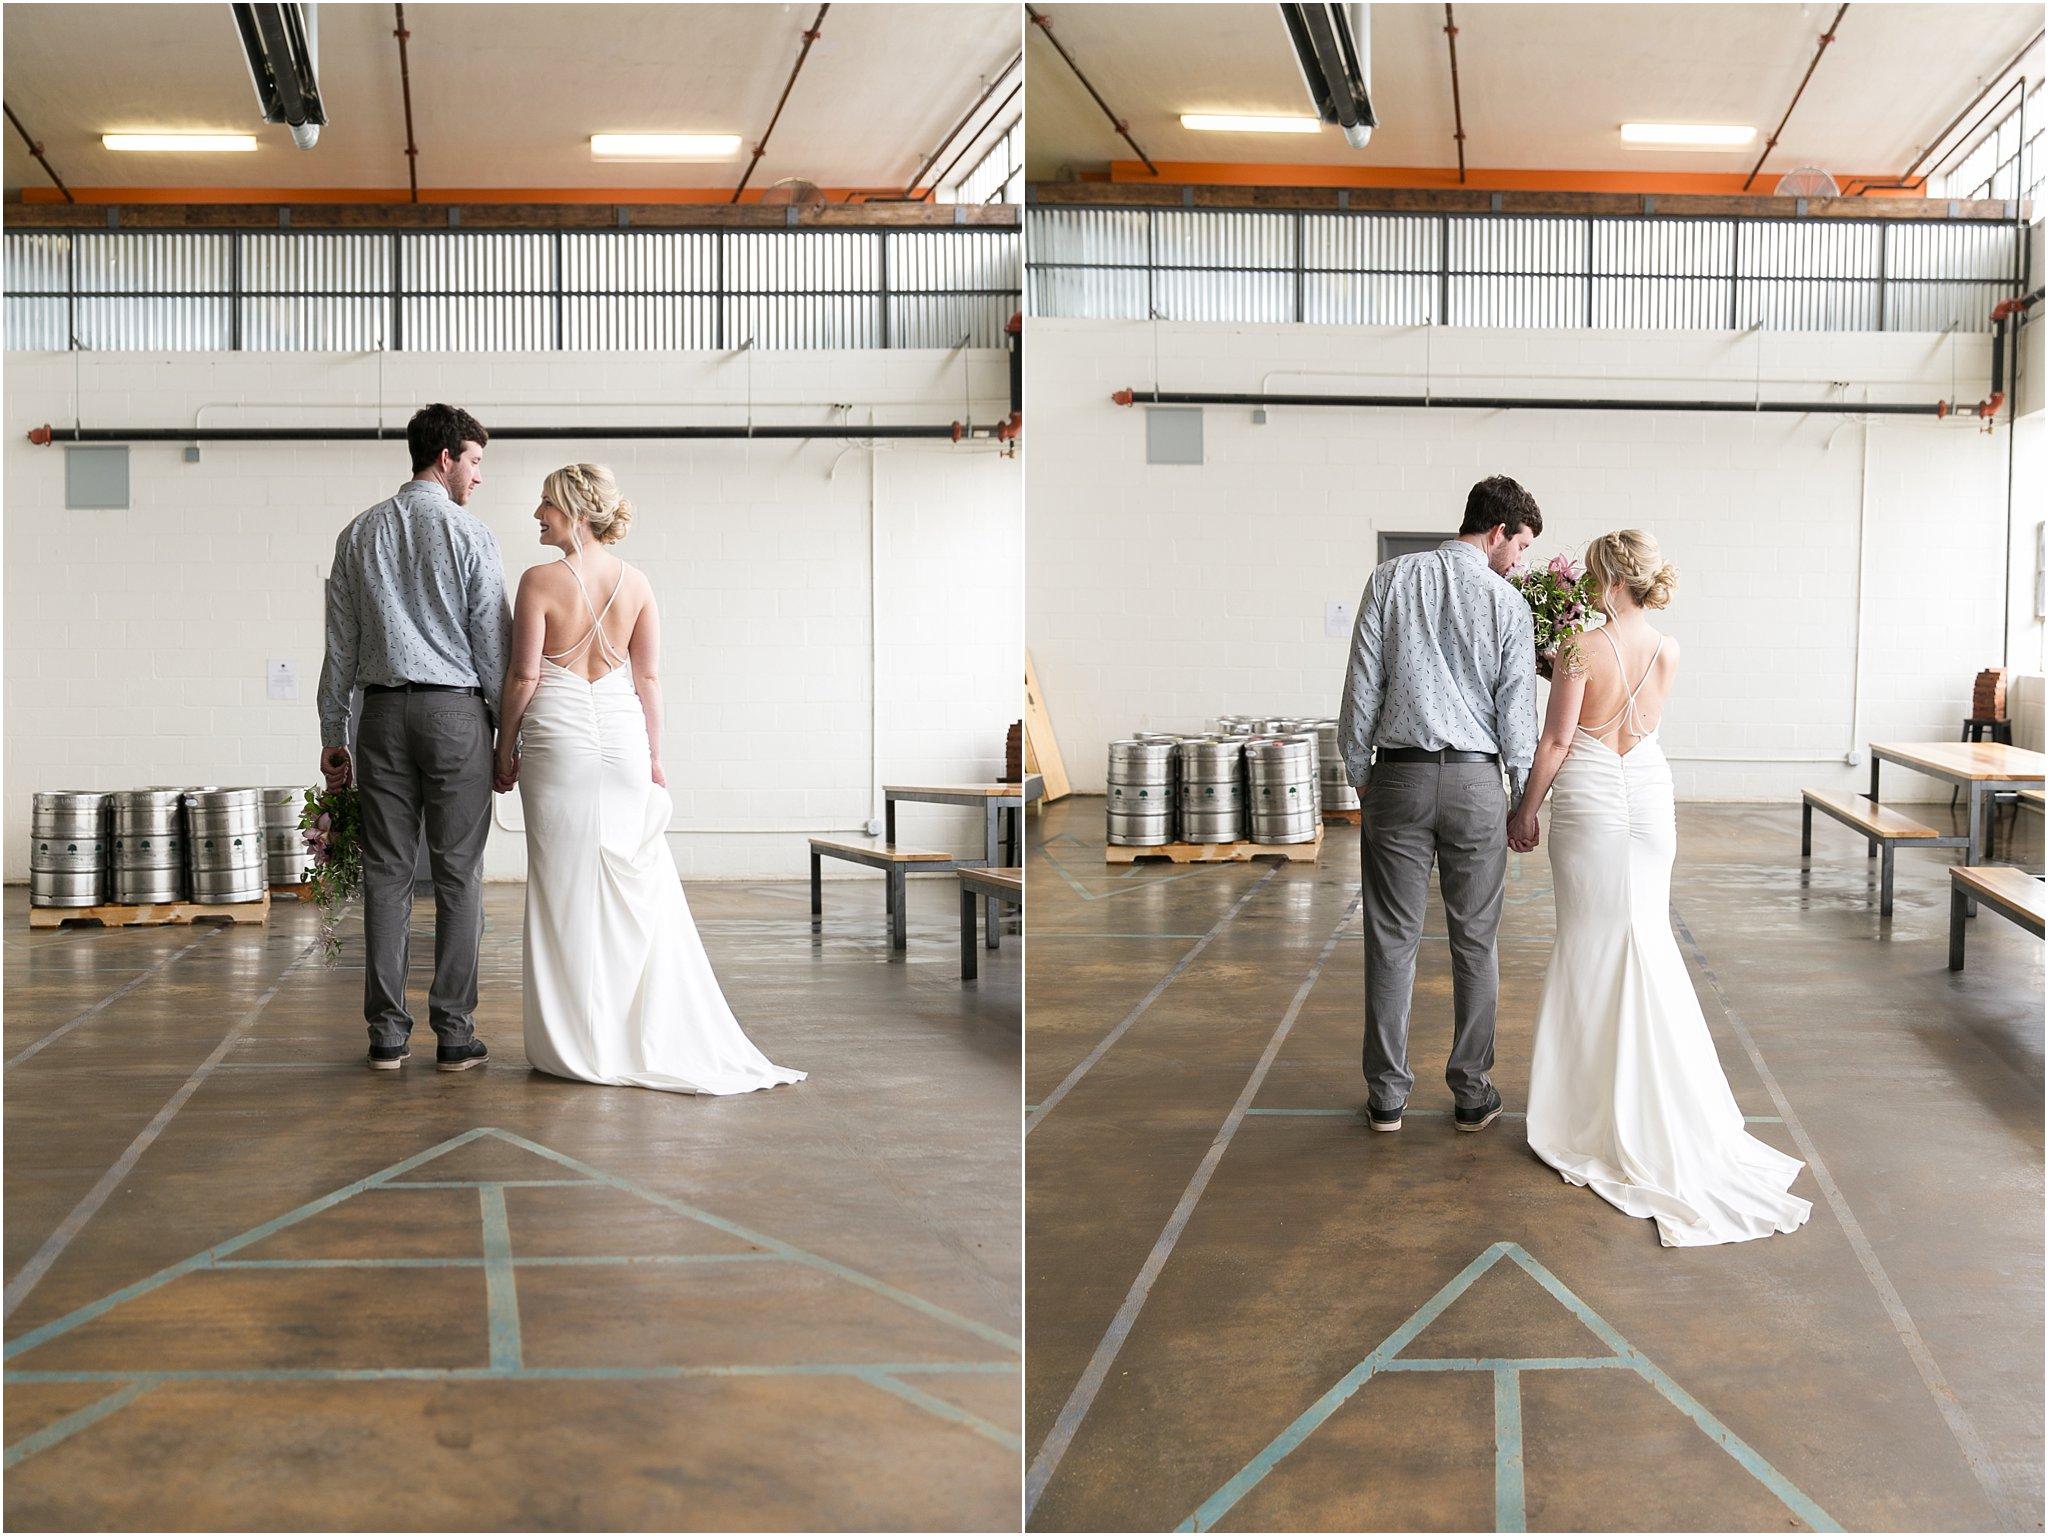 jessica_ryan_photography_oconnor_brewing_wedding_oconnor_brewing_co_norfolk_virginia_roost_flowers_blue_birds_garage__0799